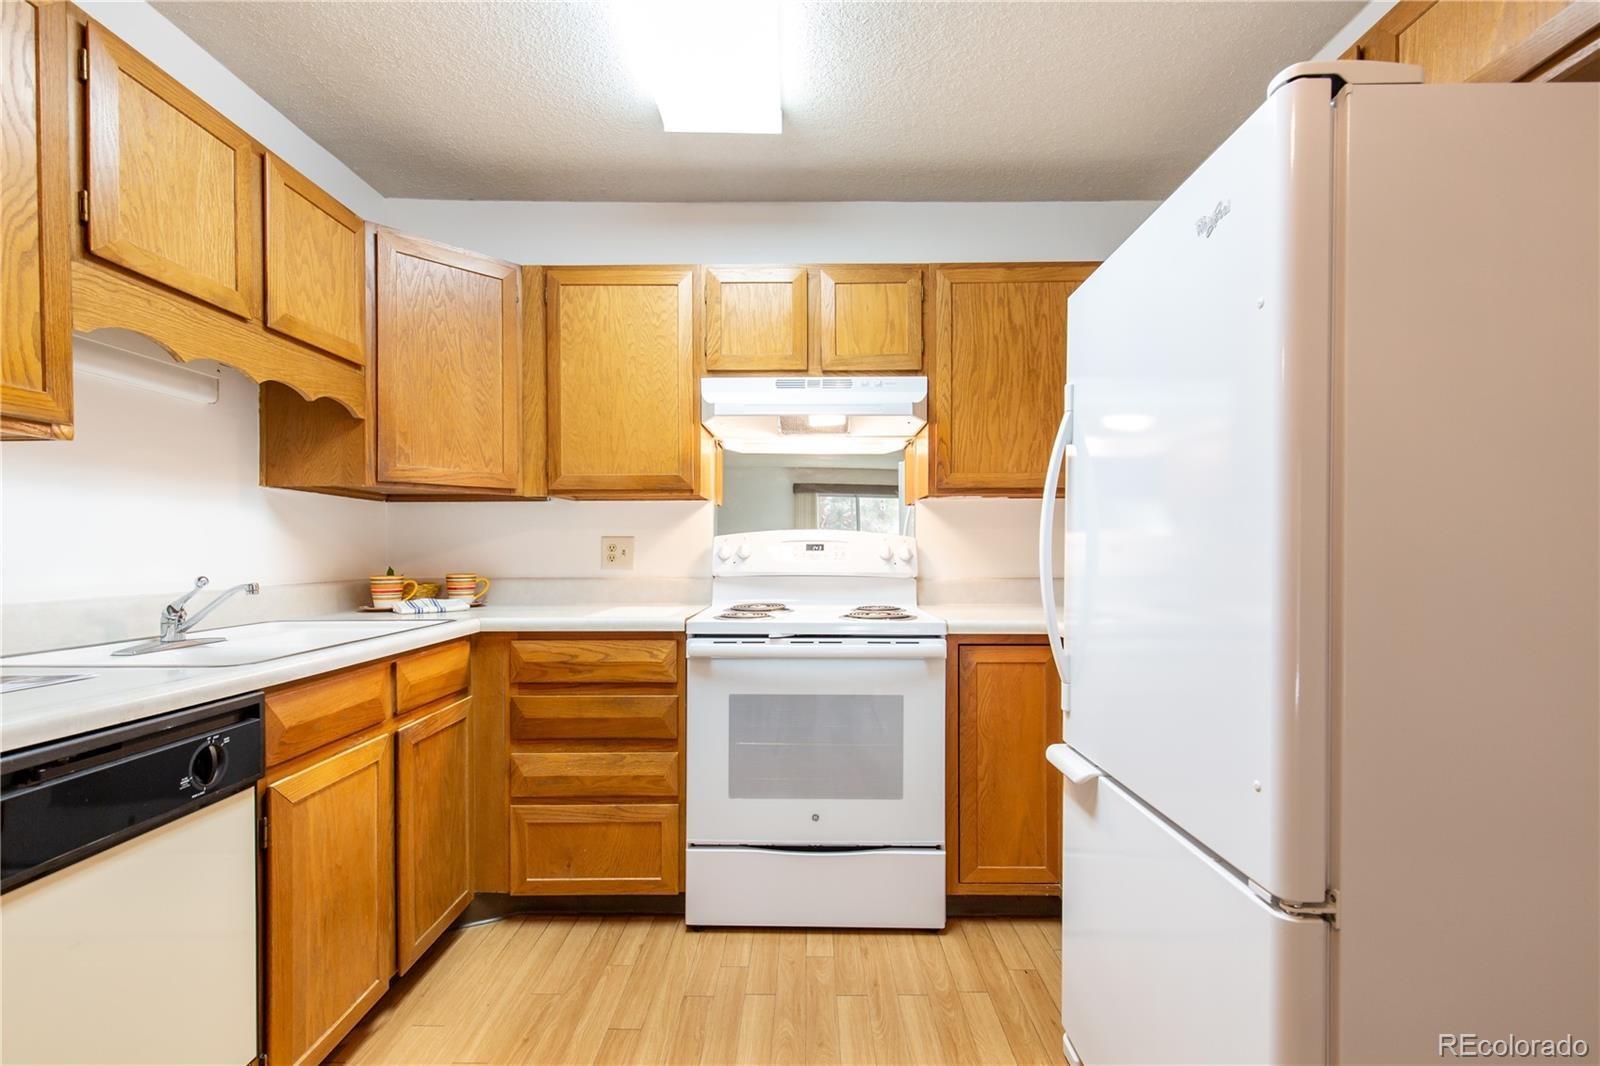 MLS# 8258925 - 6 - 13635 E Bates Avenue #207, Aurora, CO 80014